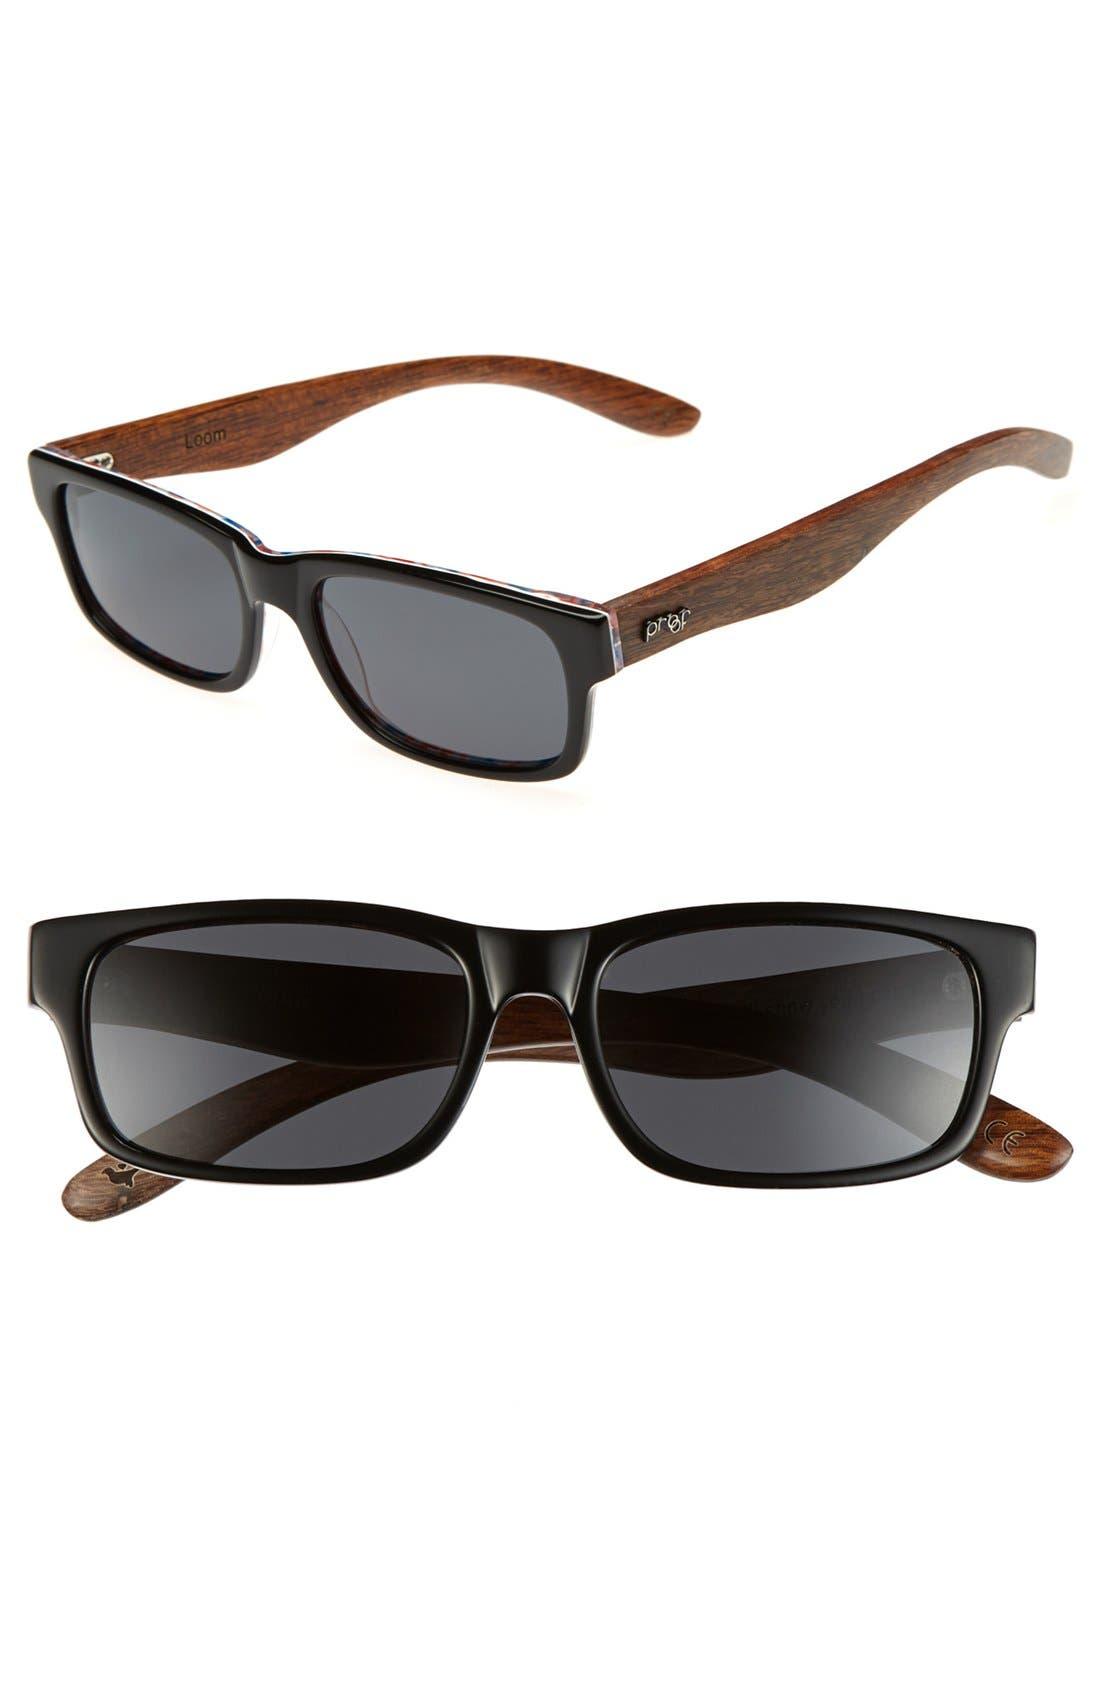 Main Image - Proof Eyewear 'Loom' 51mm Polarized Sunglasses